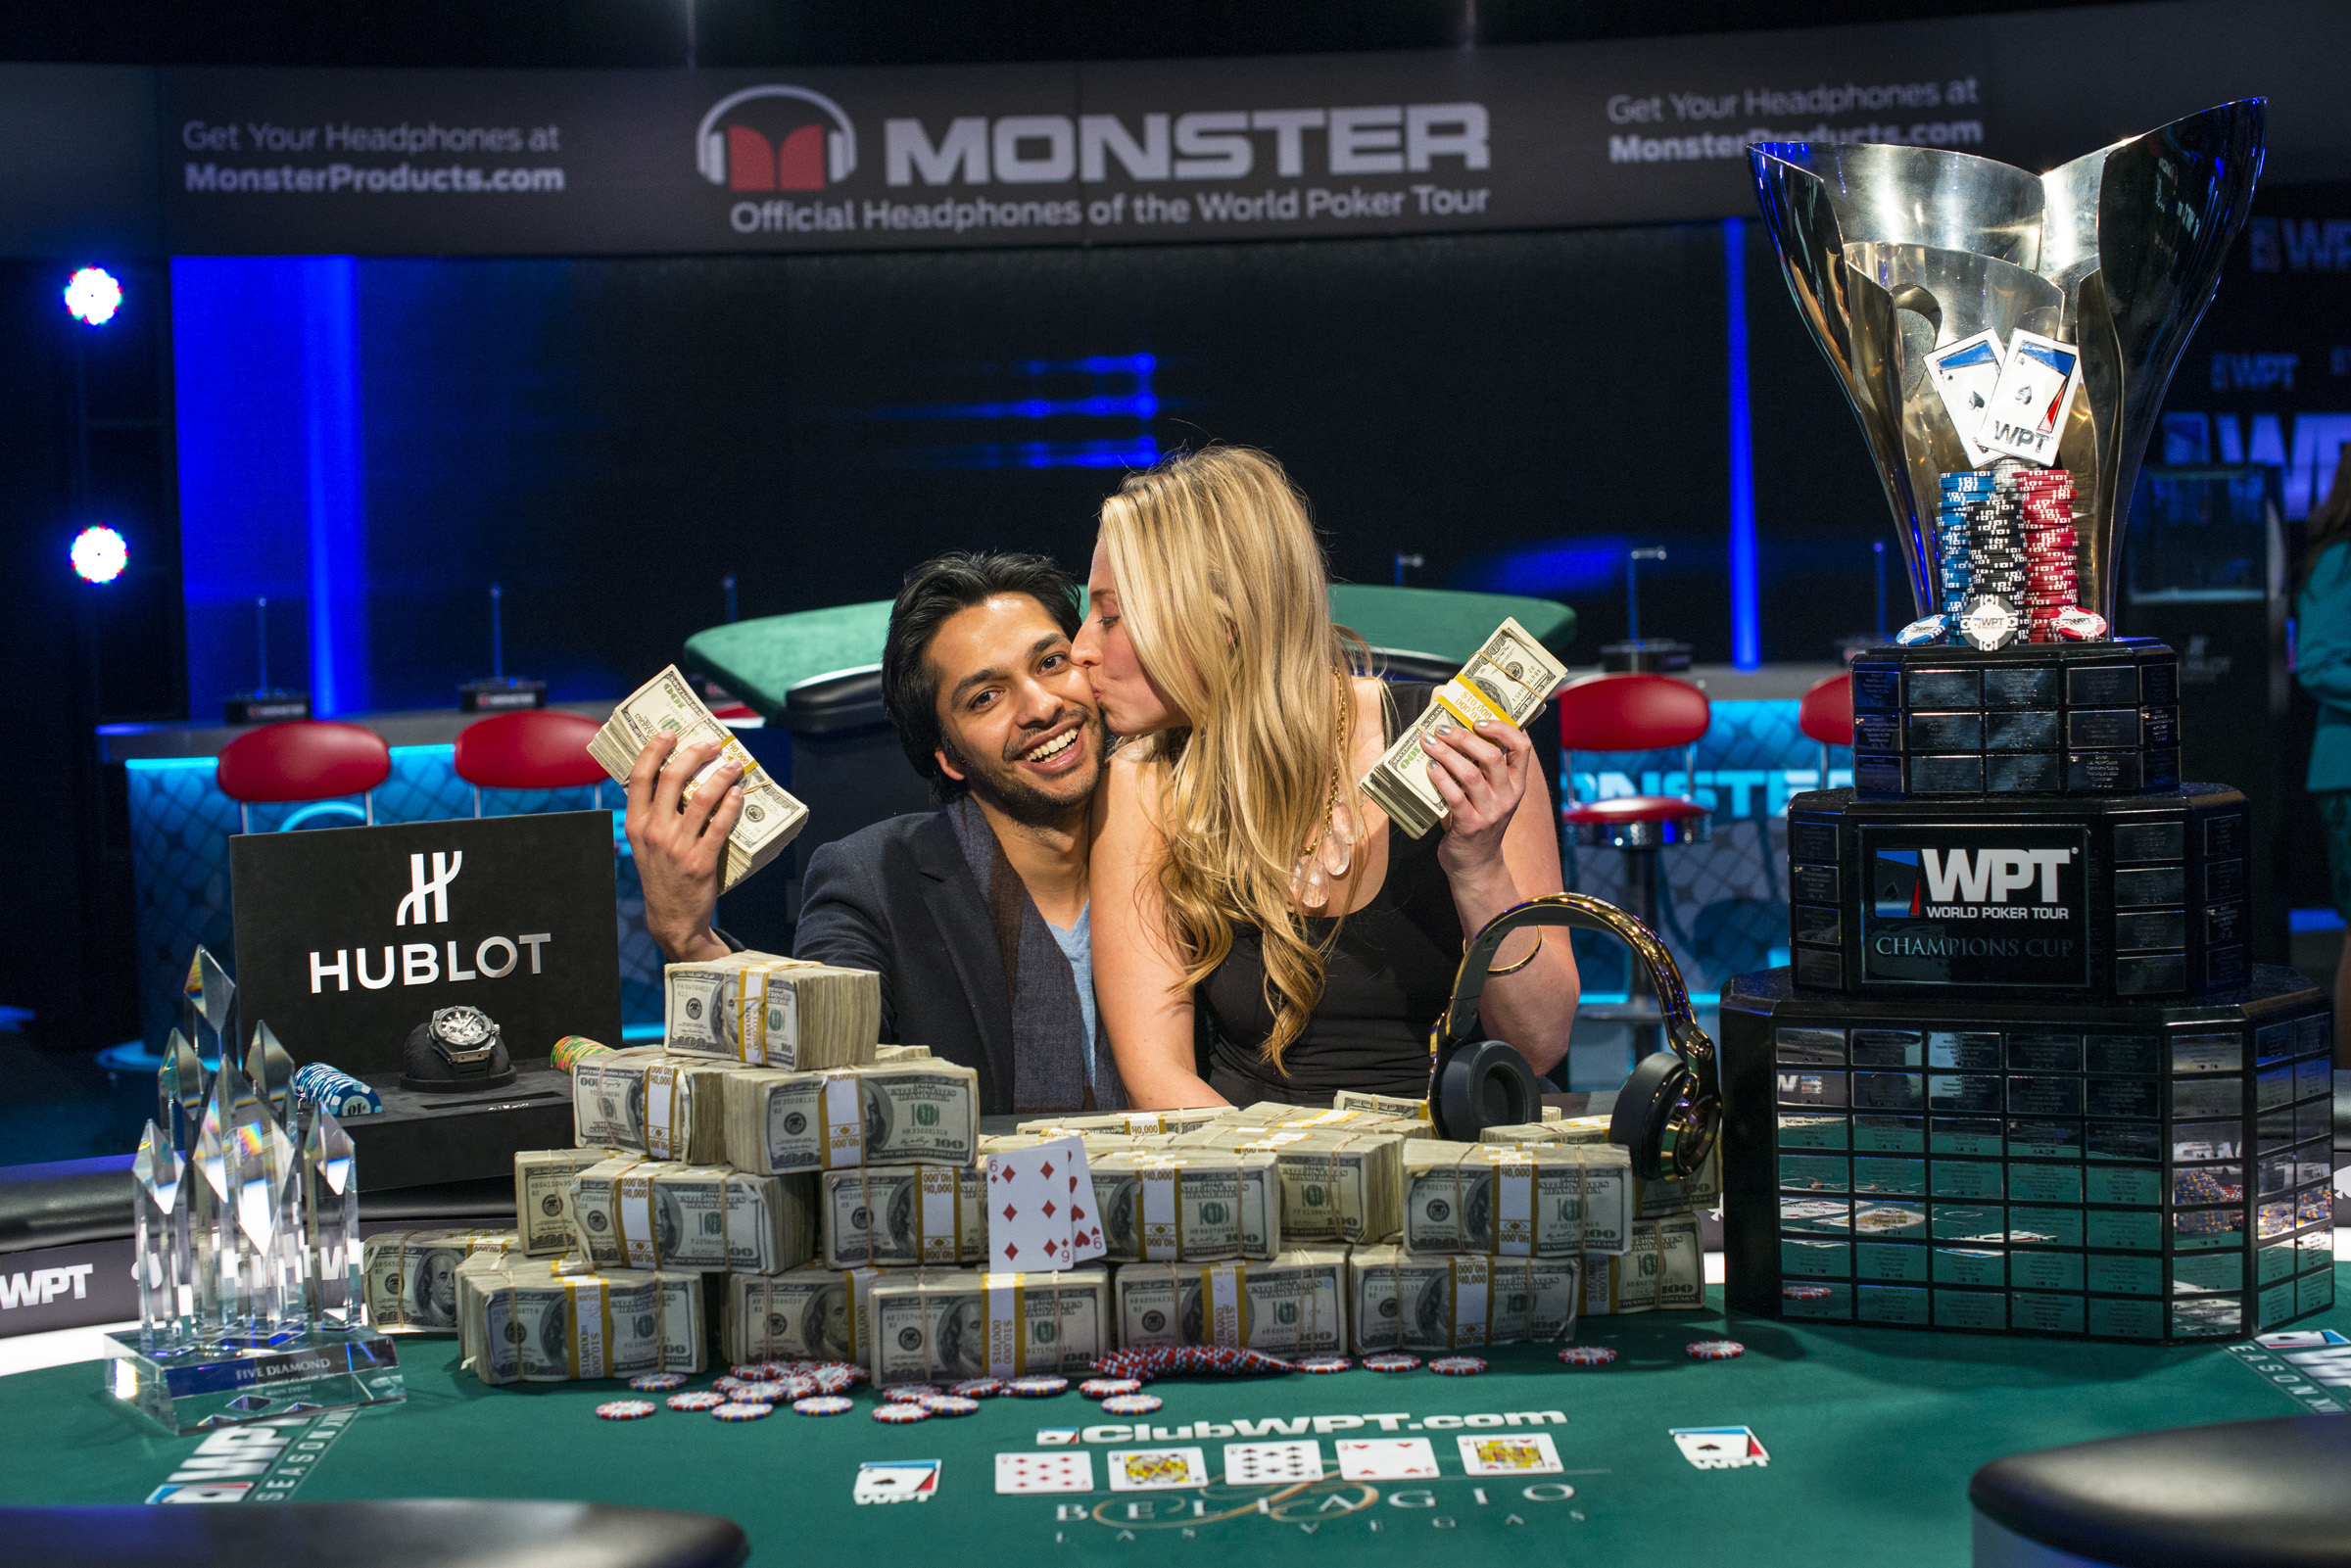 Vegas world poker tour micromax 3g tablet with sim slot